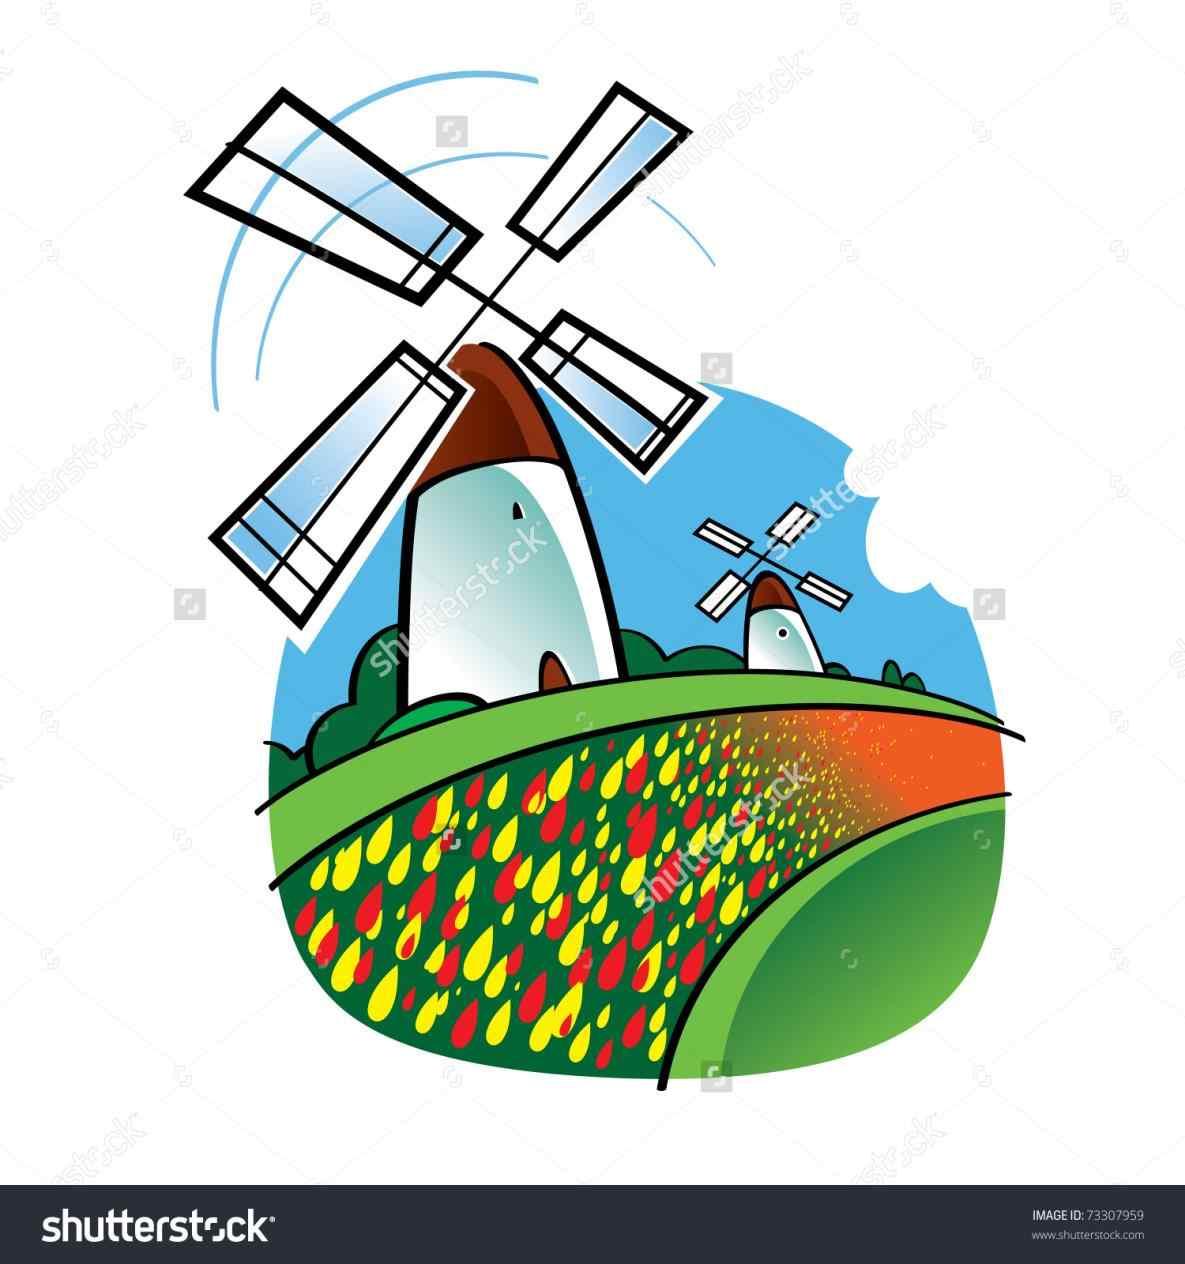 1185x1264 Free Download Clip Art On Minigolf Windmill Gouache Illustration